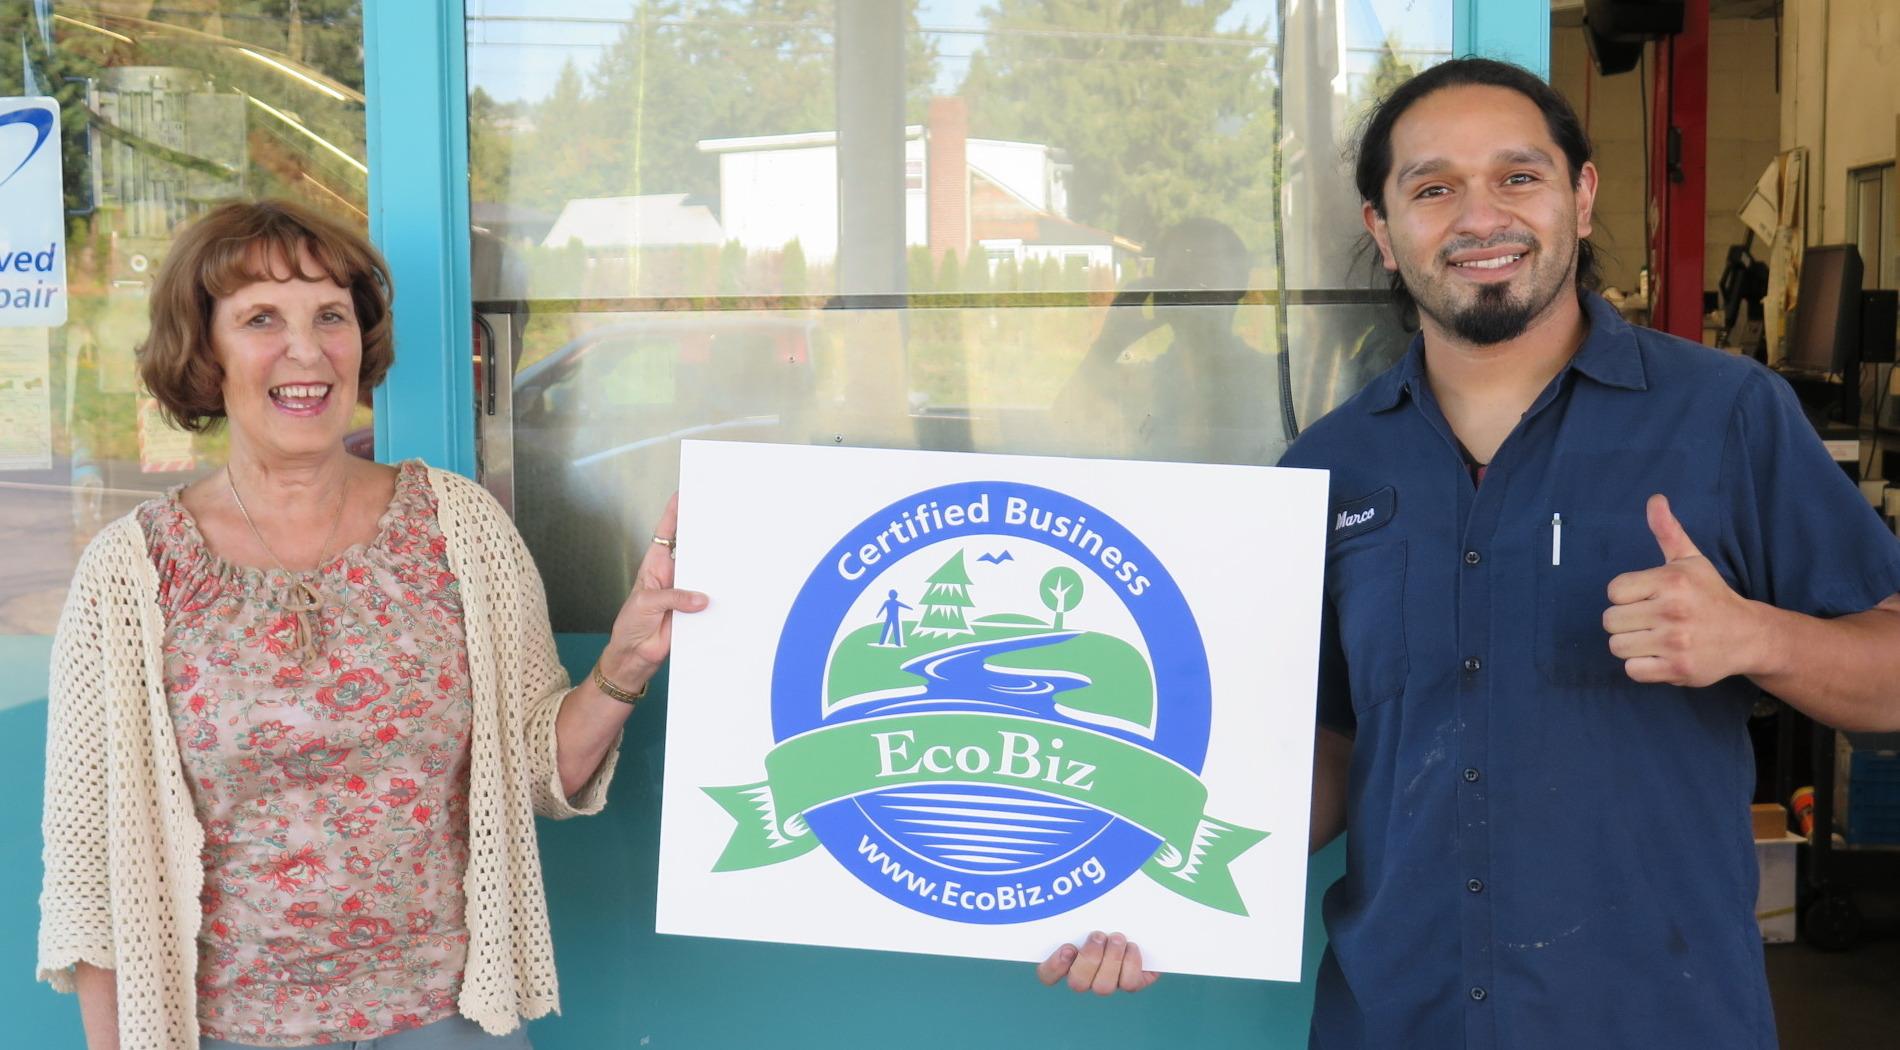 Du Fresne's Auto Repair EcoBiz Certified